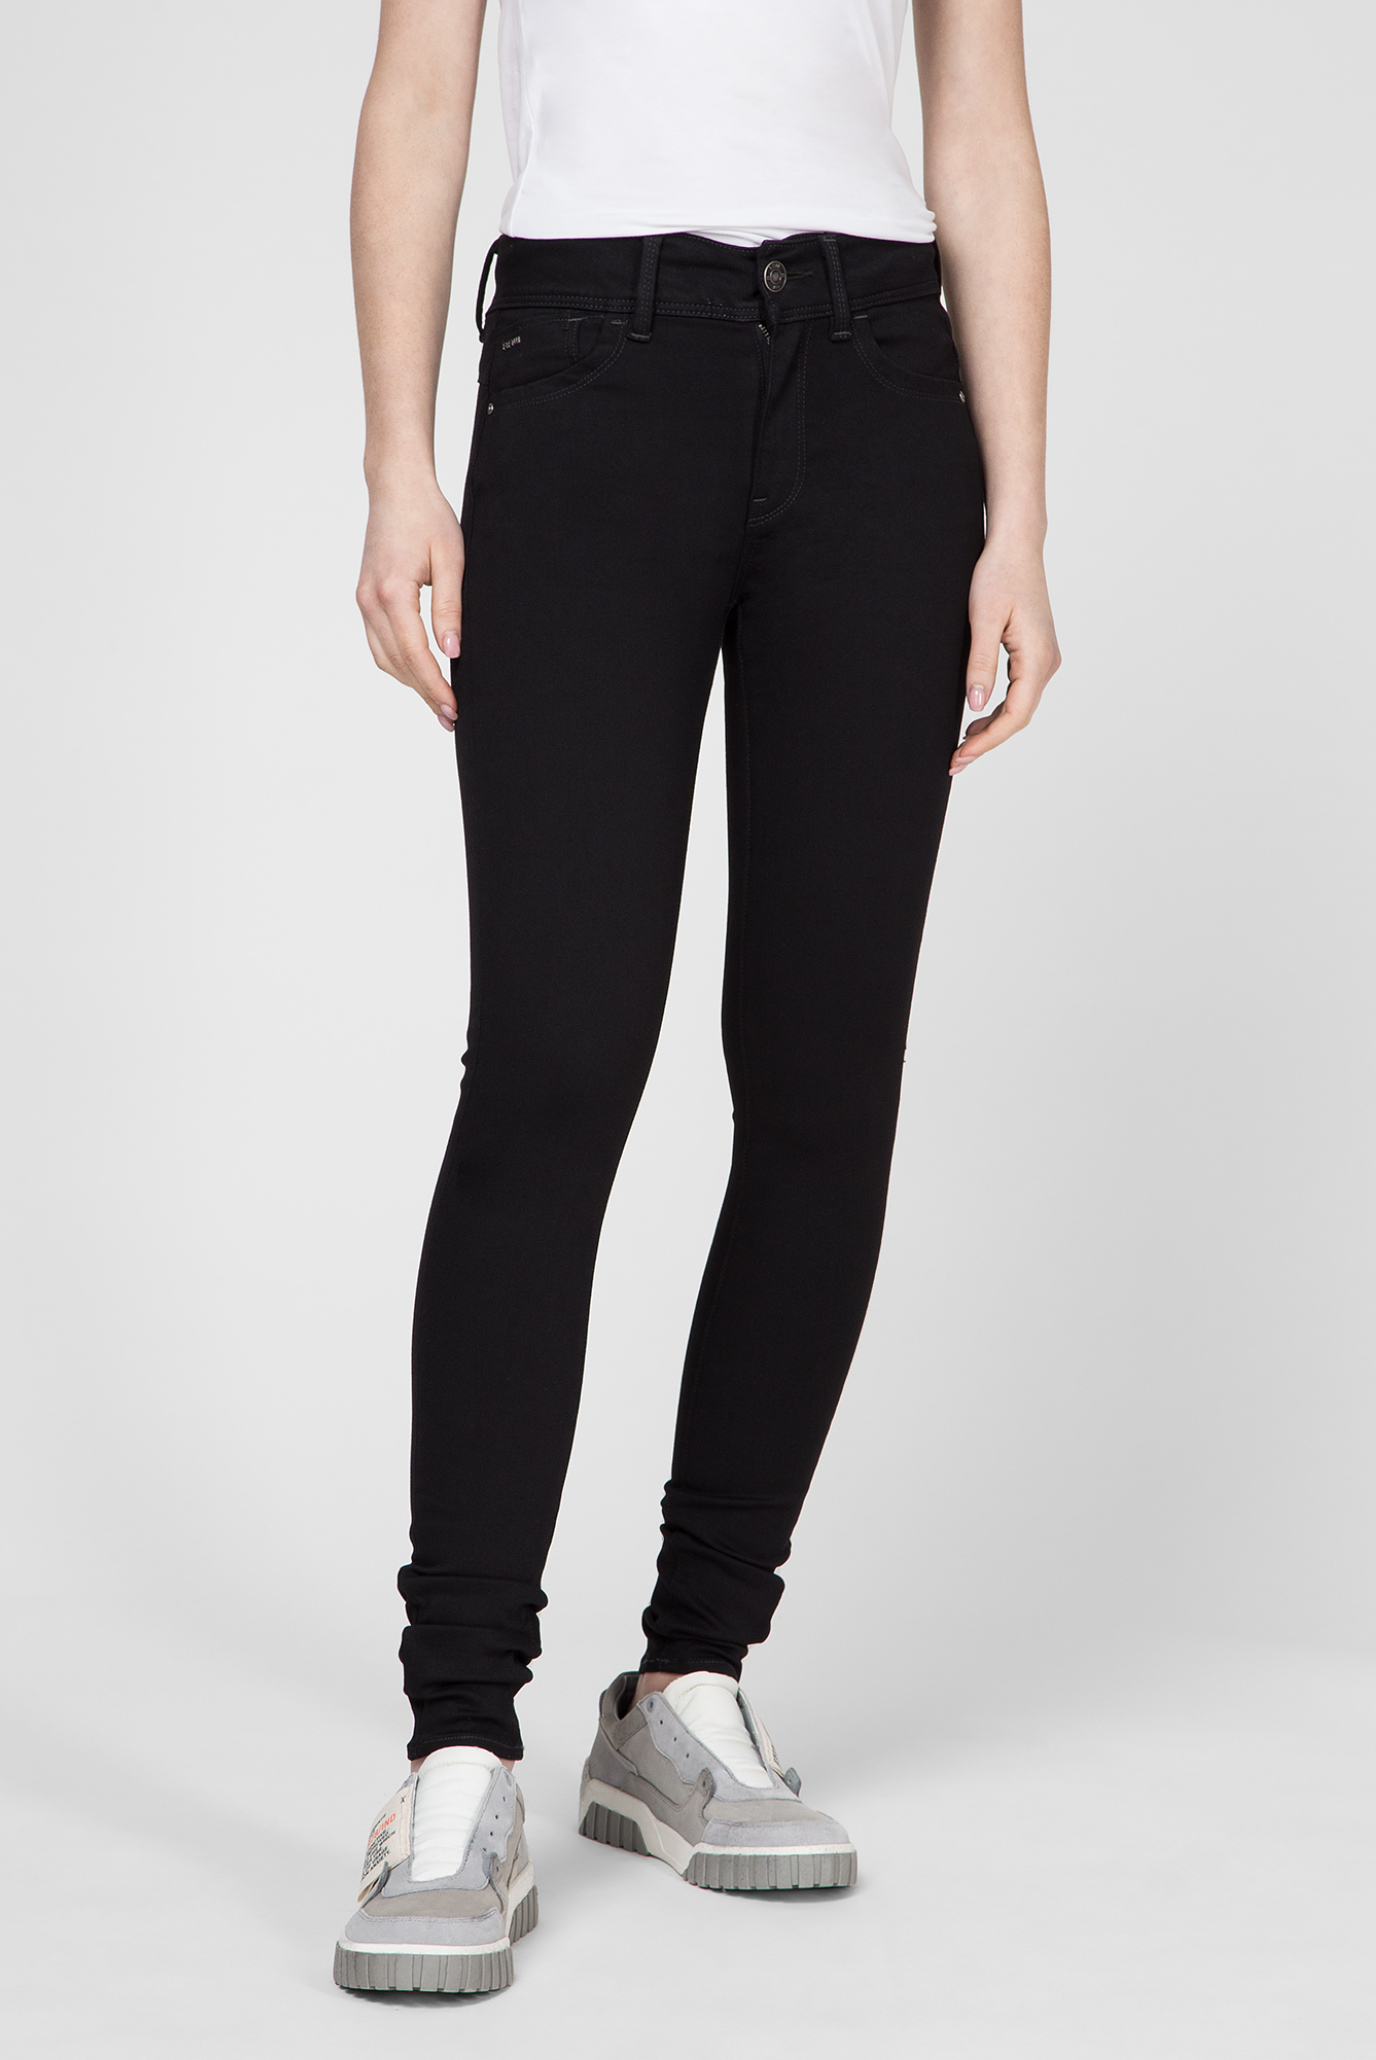 Купить Женские черные джинсы Lynn High Super Skinny G-Star RAW G-Star RAW D14332,9142 – Киев, Украина. Цены в интернет магазине MD Fashion